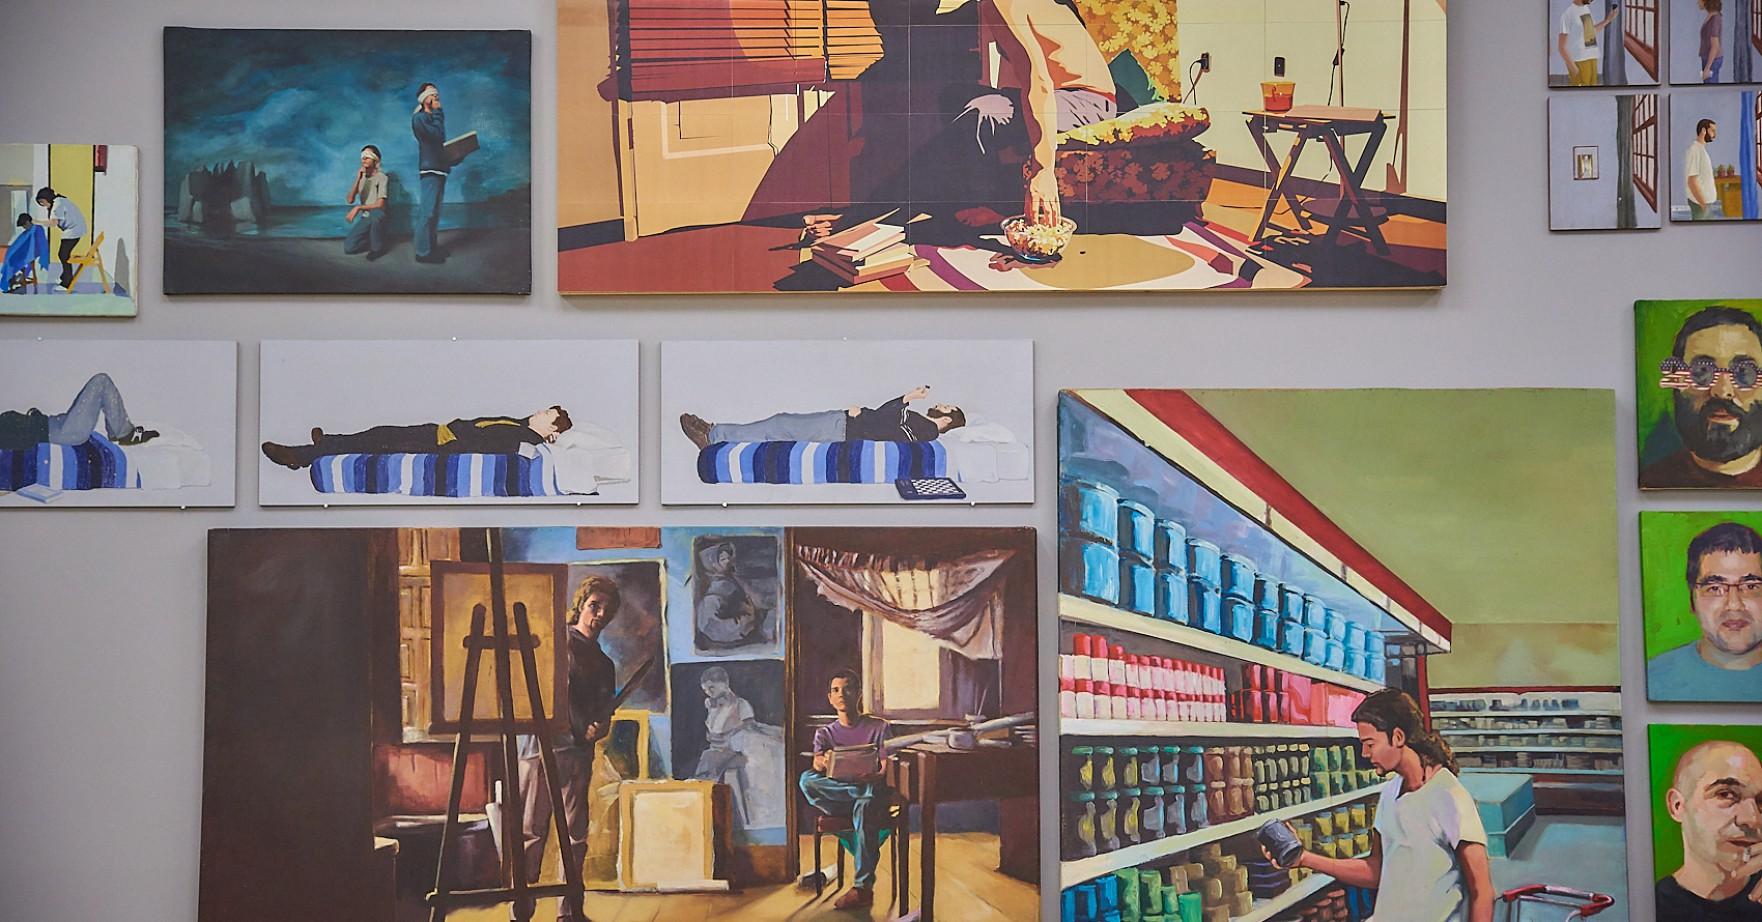 'Enseñar el arte: la indisciplina académica'